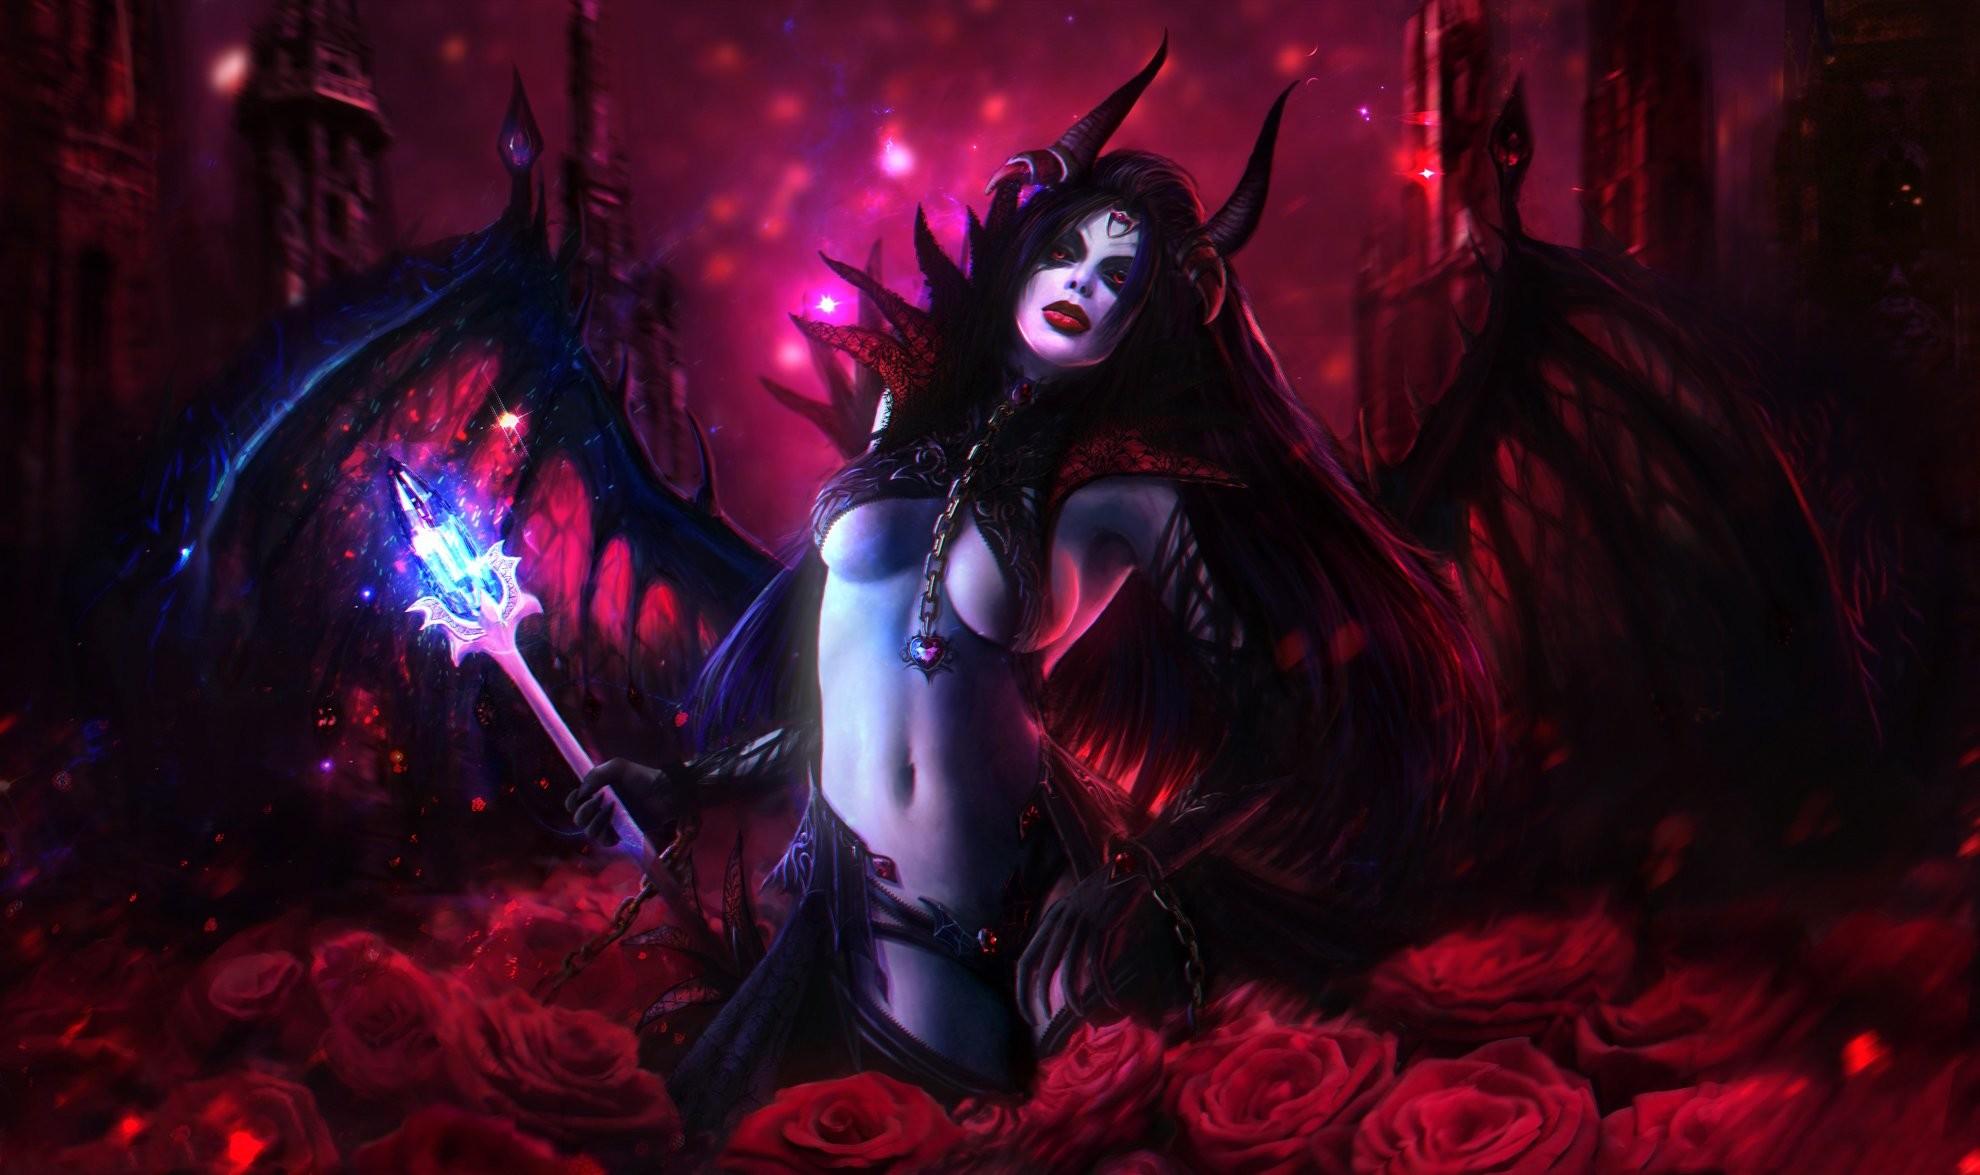 DOTA 2 Queen of Pain Demon Roses Mage Staff Games Girls Fantasy dark  vampire sexy artwork